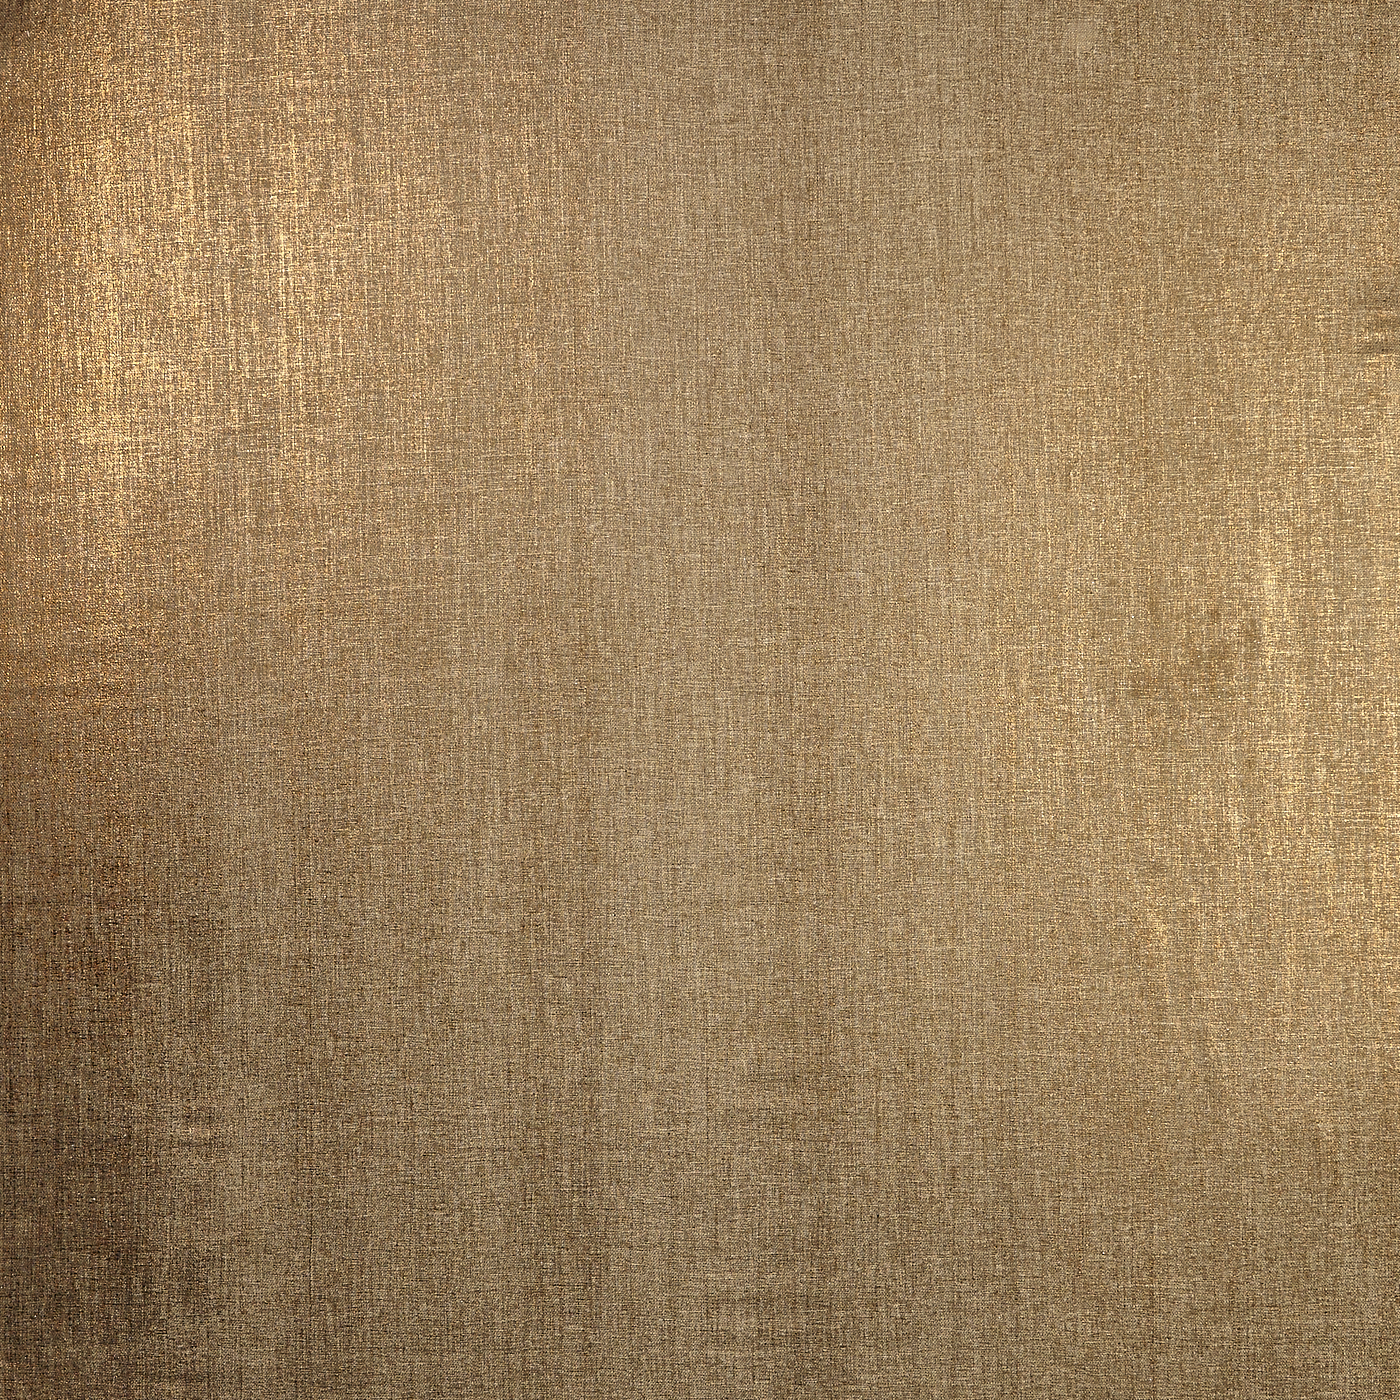 Aquilo Copper Fabric Asteria Prestigious Textiles